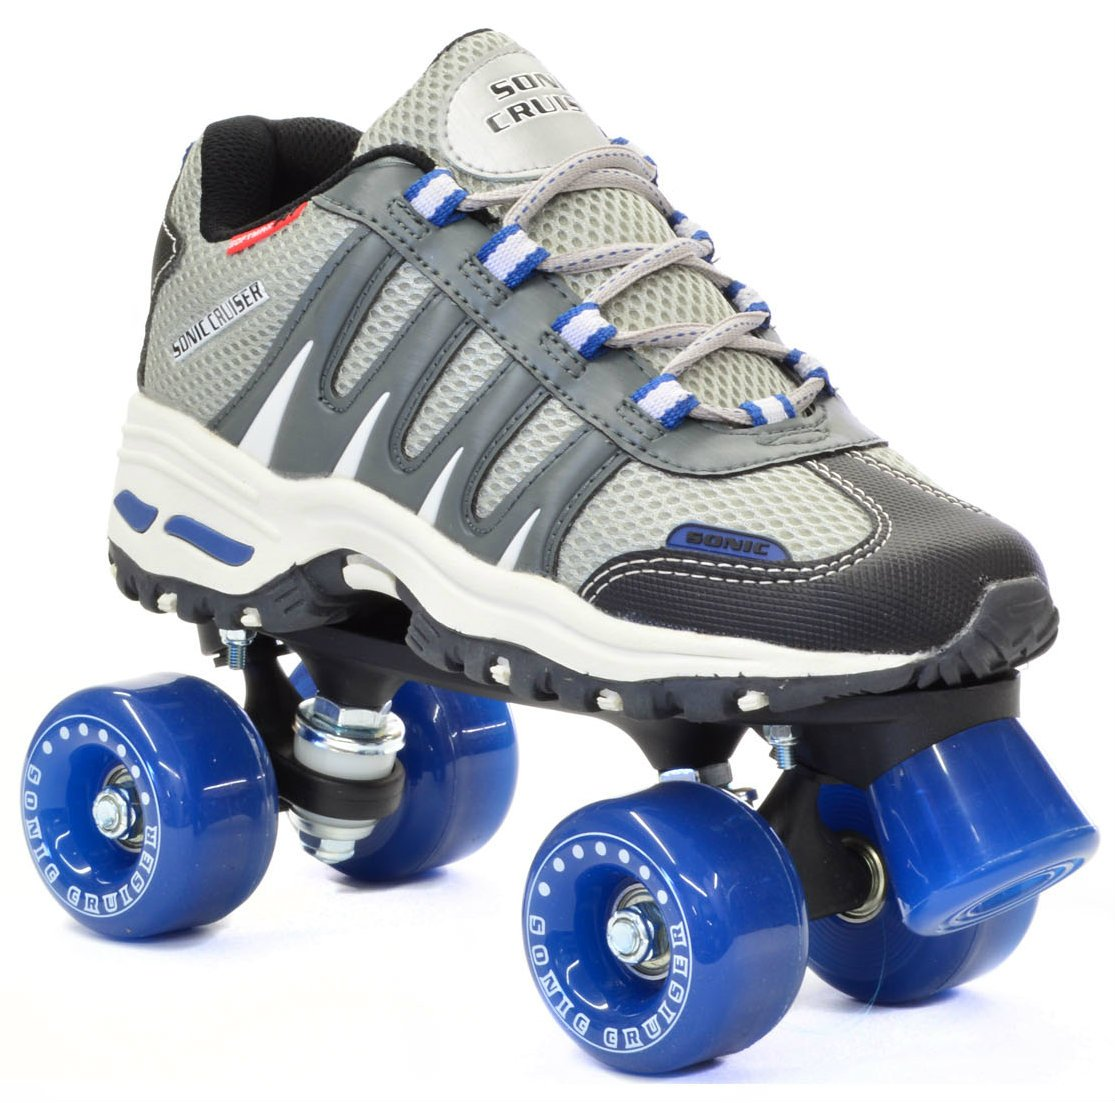 Sonic Cruiser Outdoor Skates – Sonic Cruiser Outdoor Quad Roller Skate,Gray,Mens 5 Ladies 6